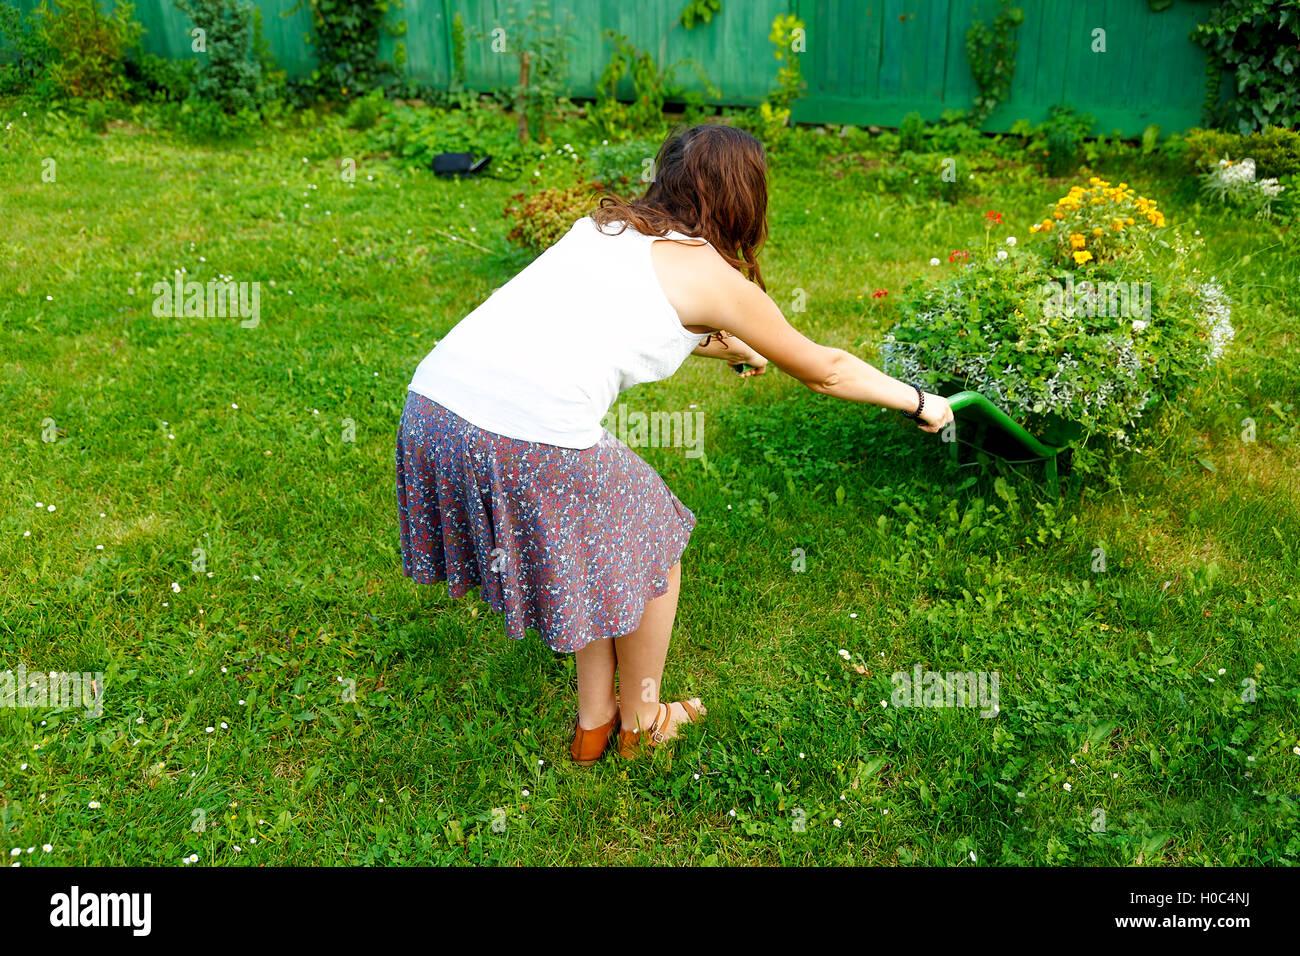 young woman in garden playfully pushing decorative wheelbarrow full ...